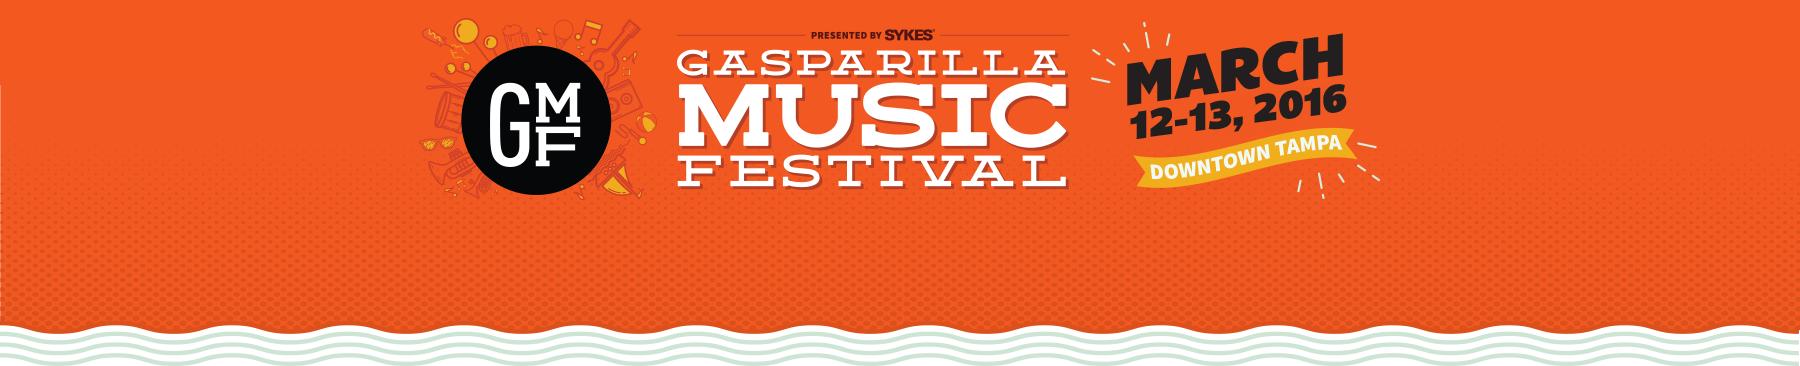 Gasparilla Music Festival Header